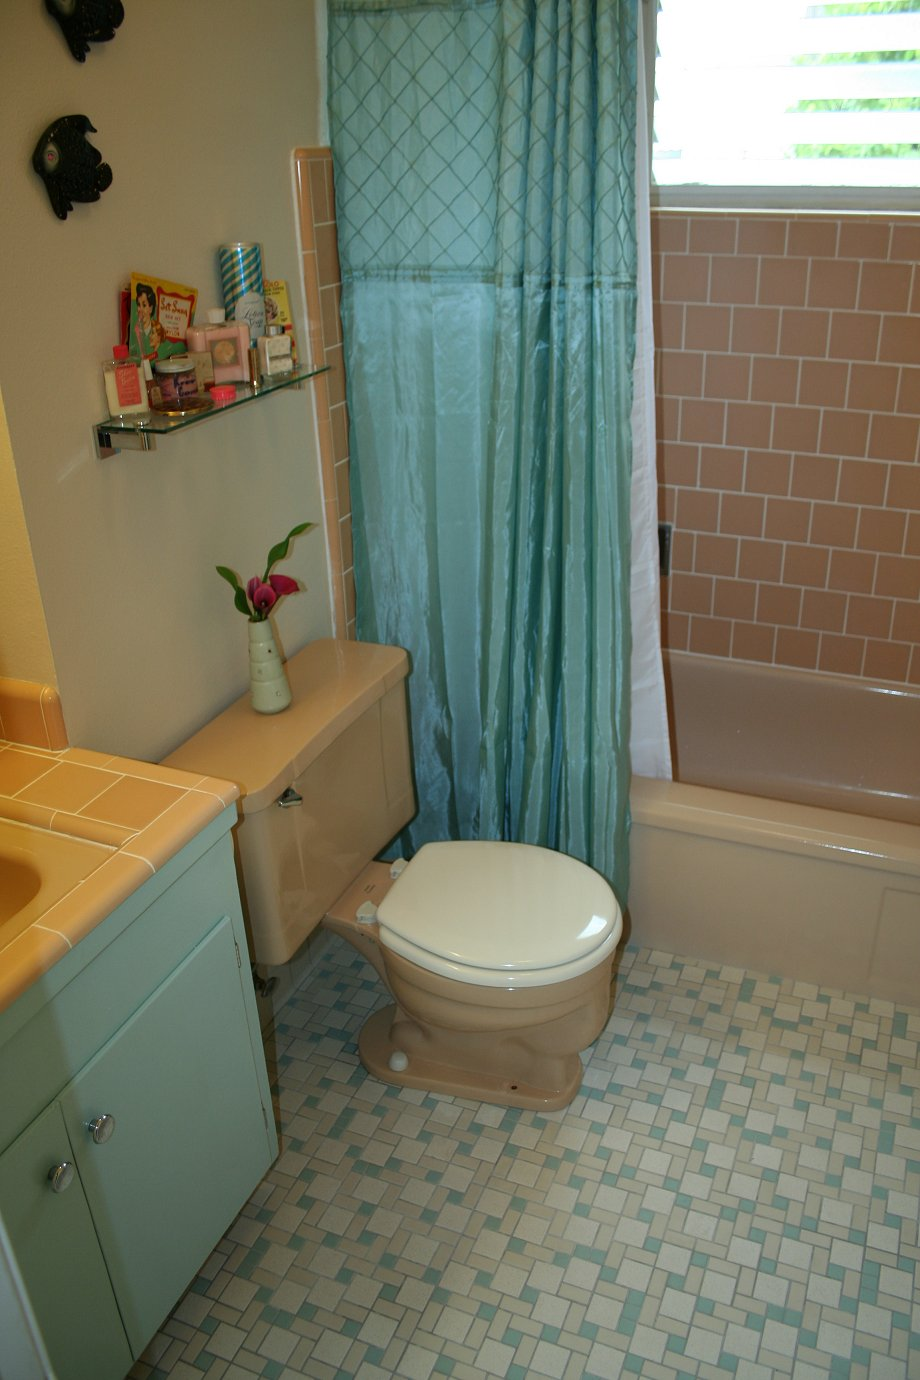 mid-century-bathroom-remodel-6-colorful-mosaic-floor-tiles-highlight-lauren-39-s-mid-century